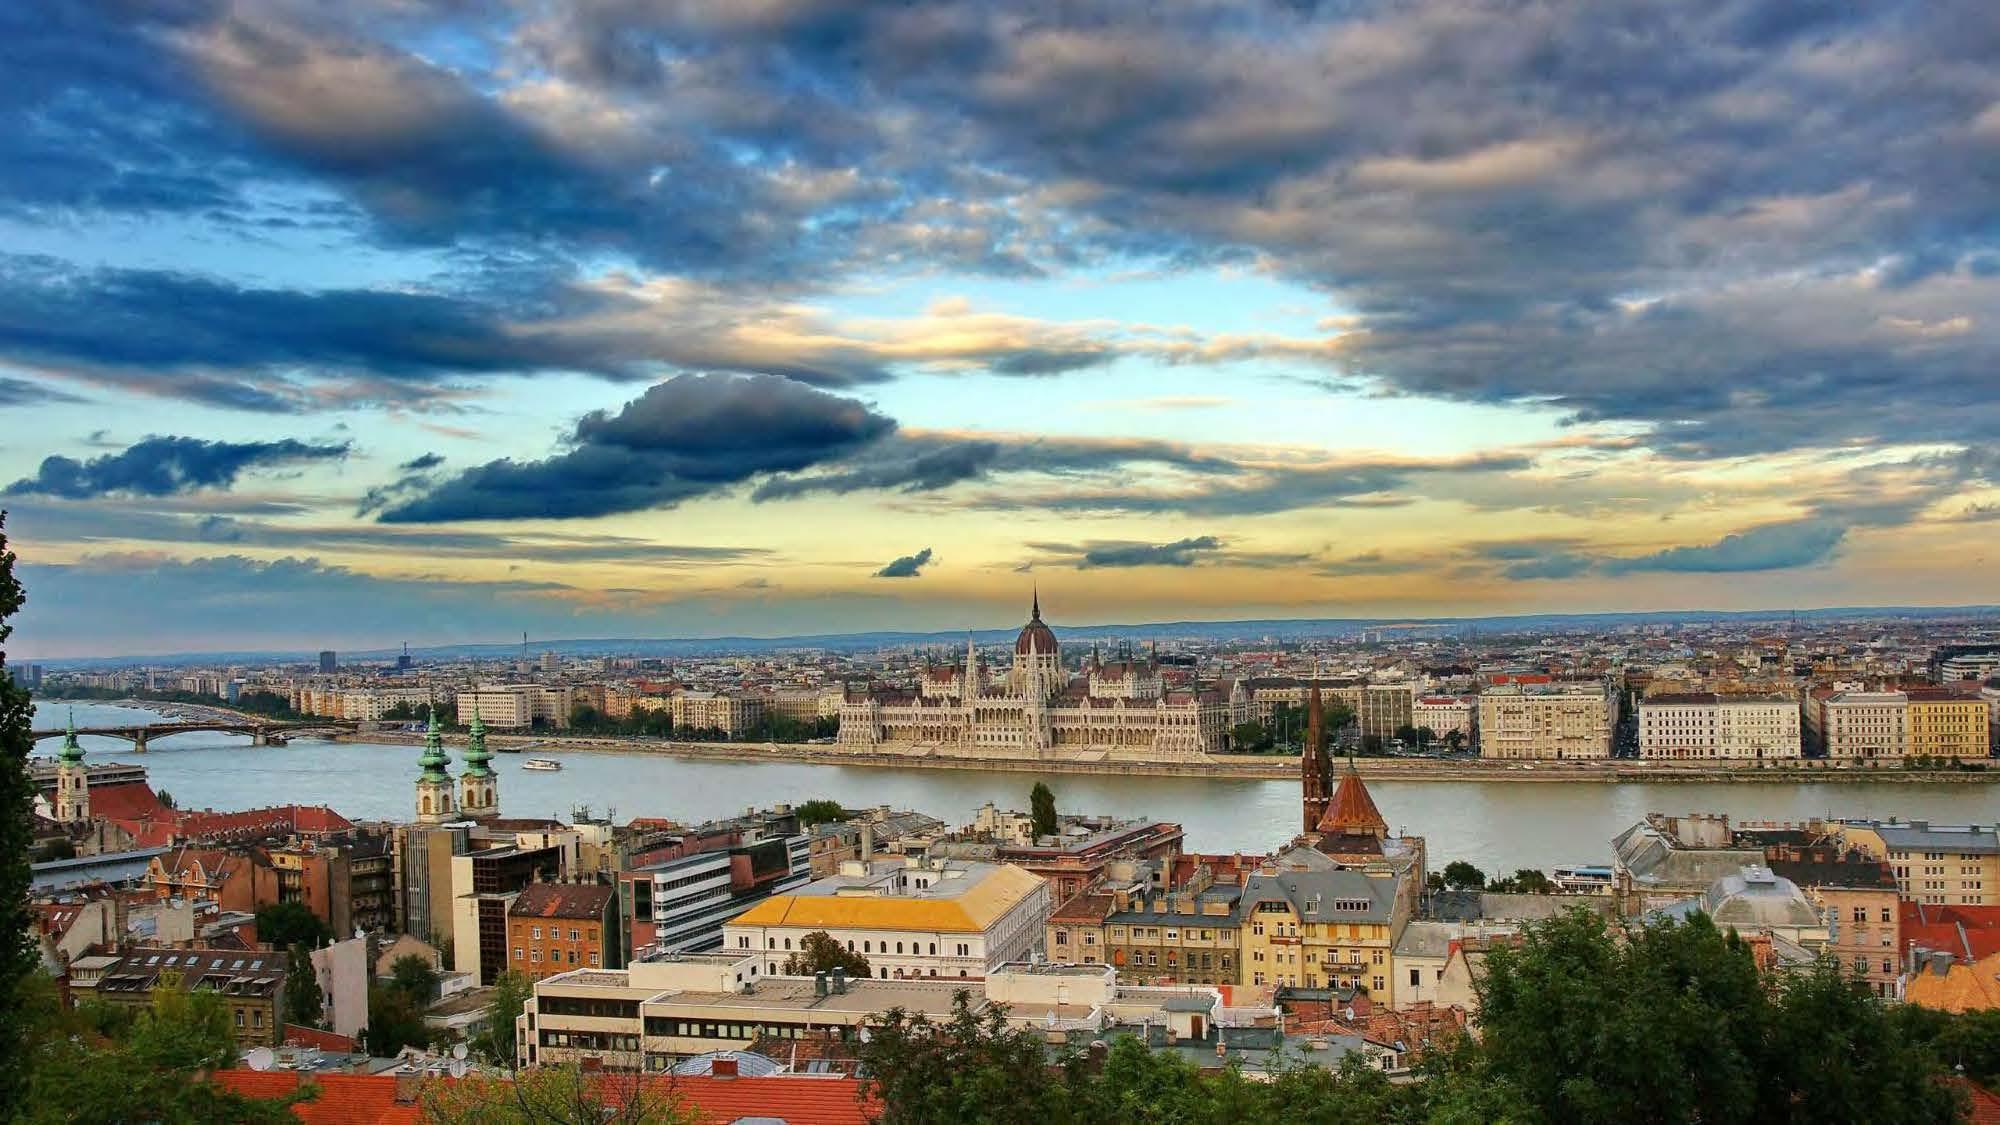 Budapest, Hungary skyline